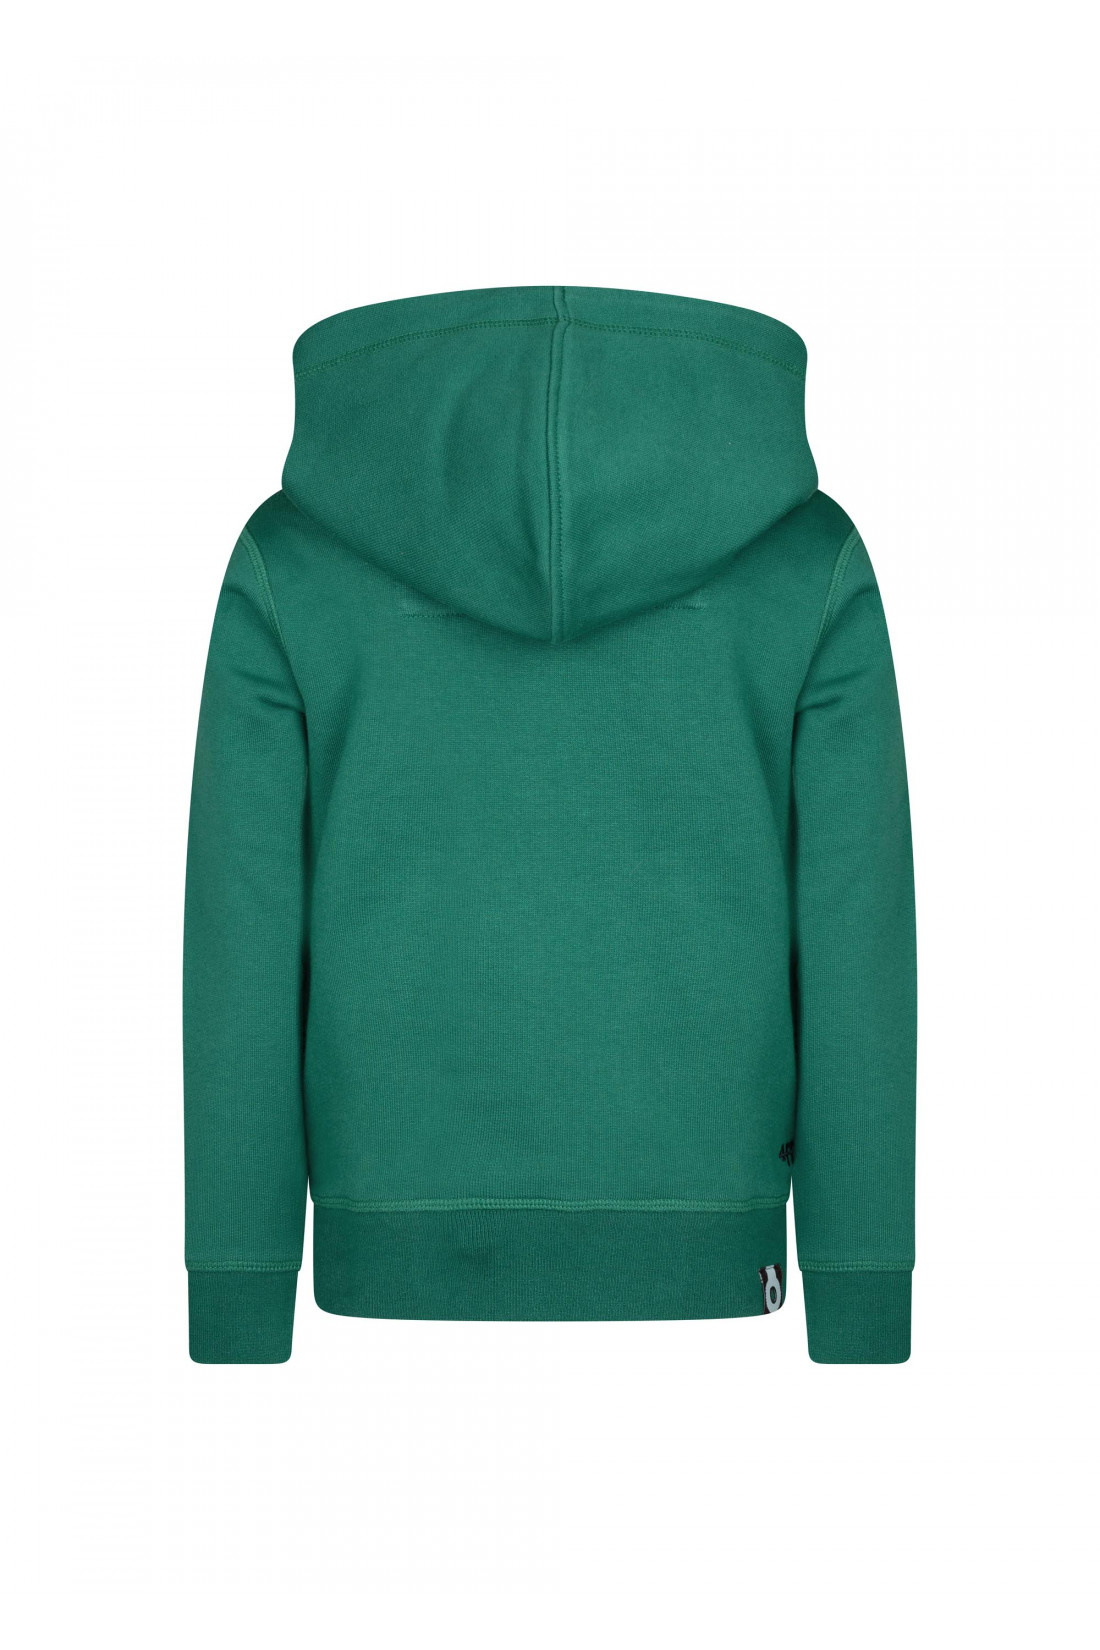 4FF sweater met kap-2